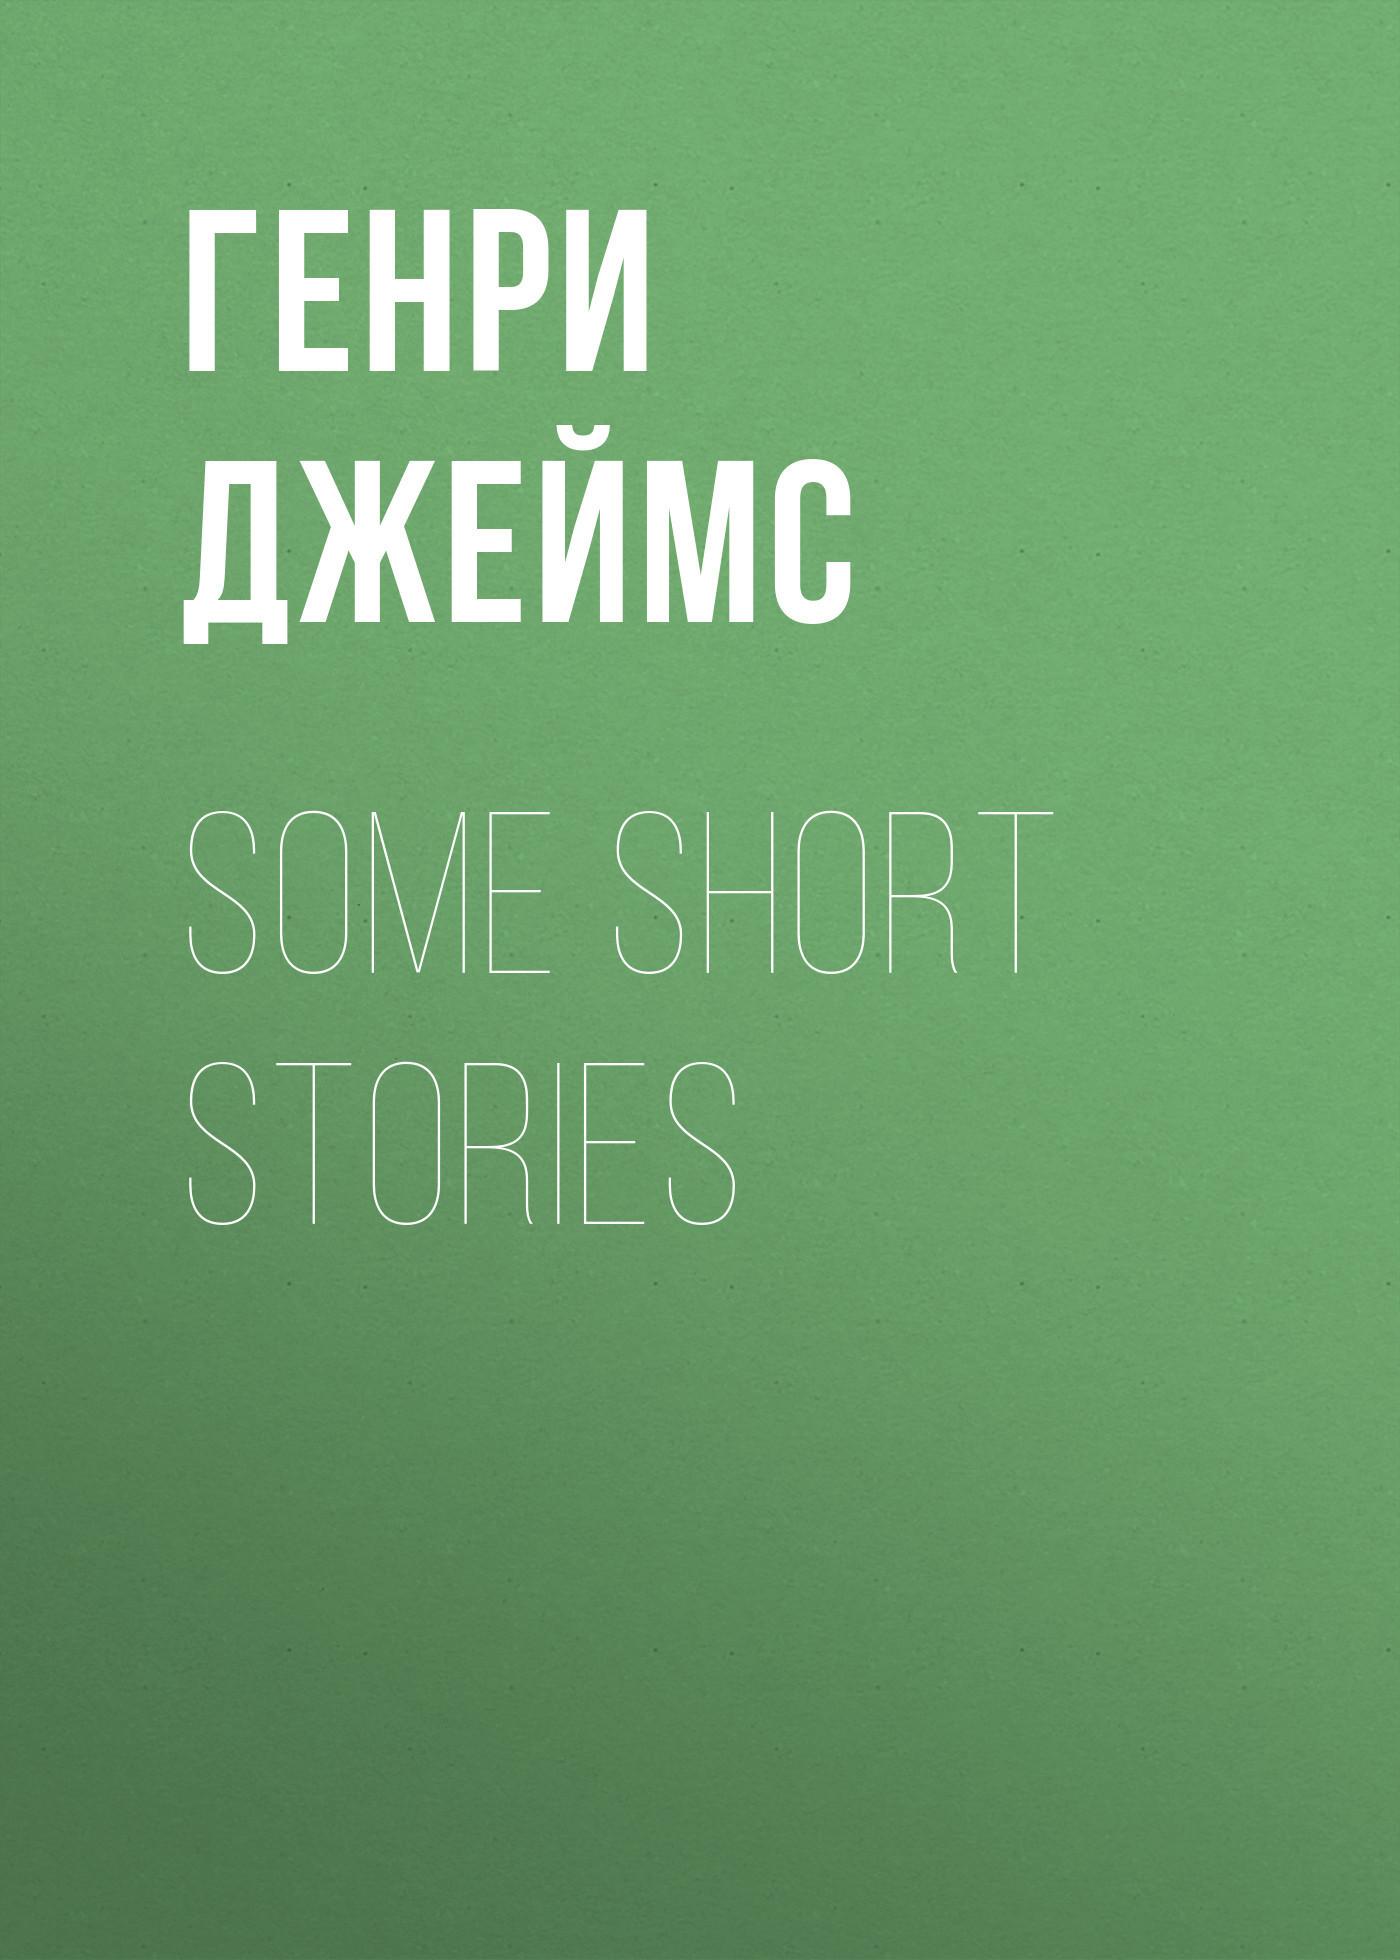 Генри Джеймс Some Short Stories vitaly mushkin erotic stories top ten